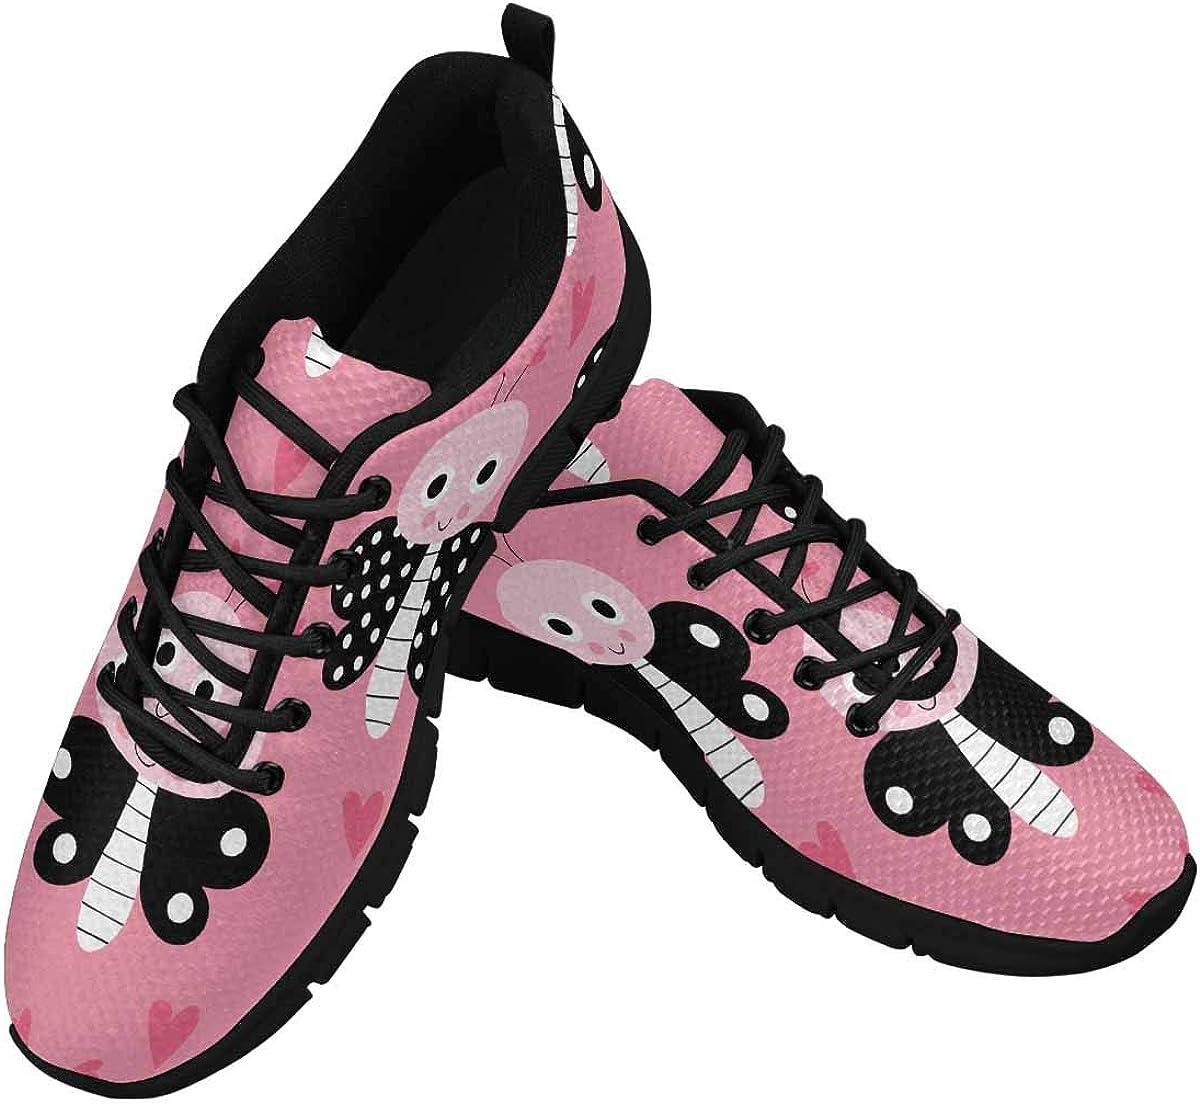 INTERESTPRINT Butterfly Background Women's Athletic Walking Shoes Comfort Mesh Non Slip